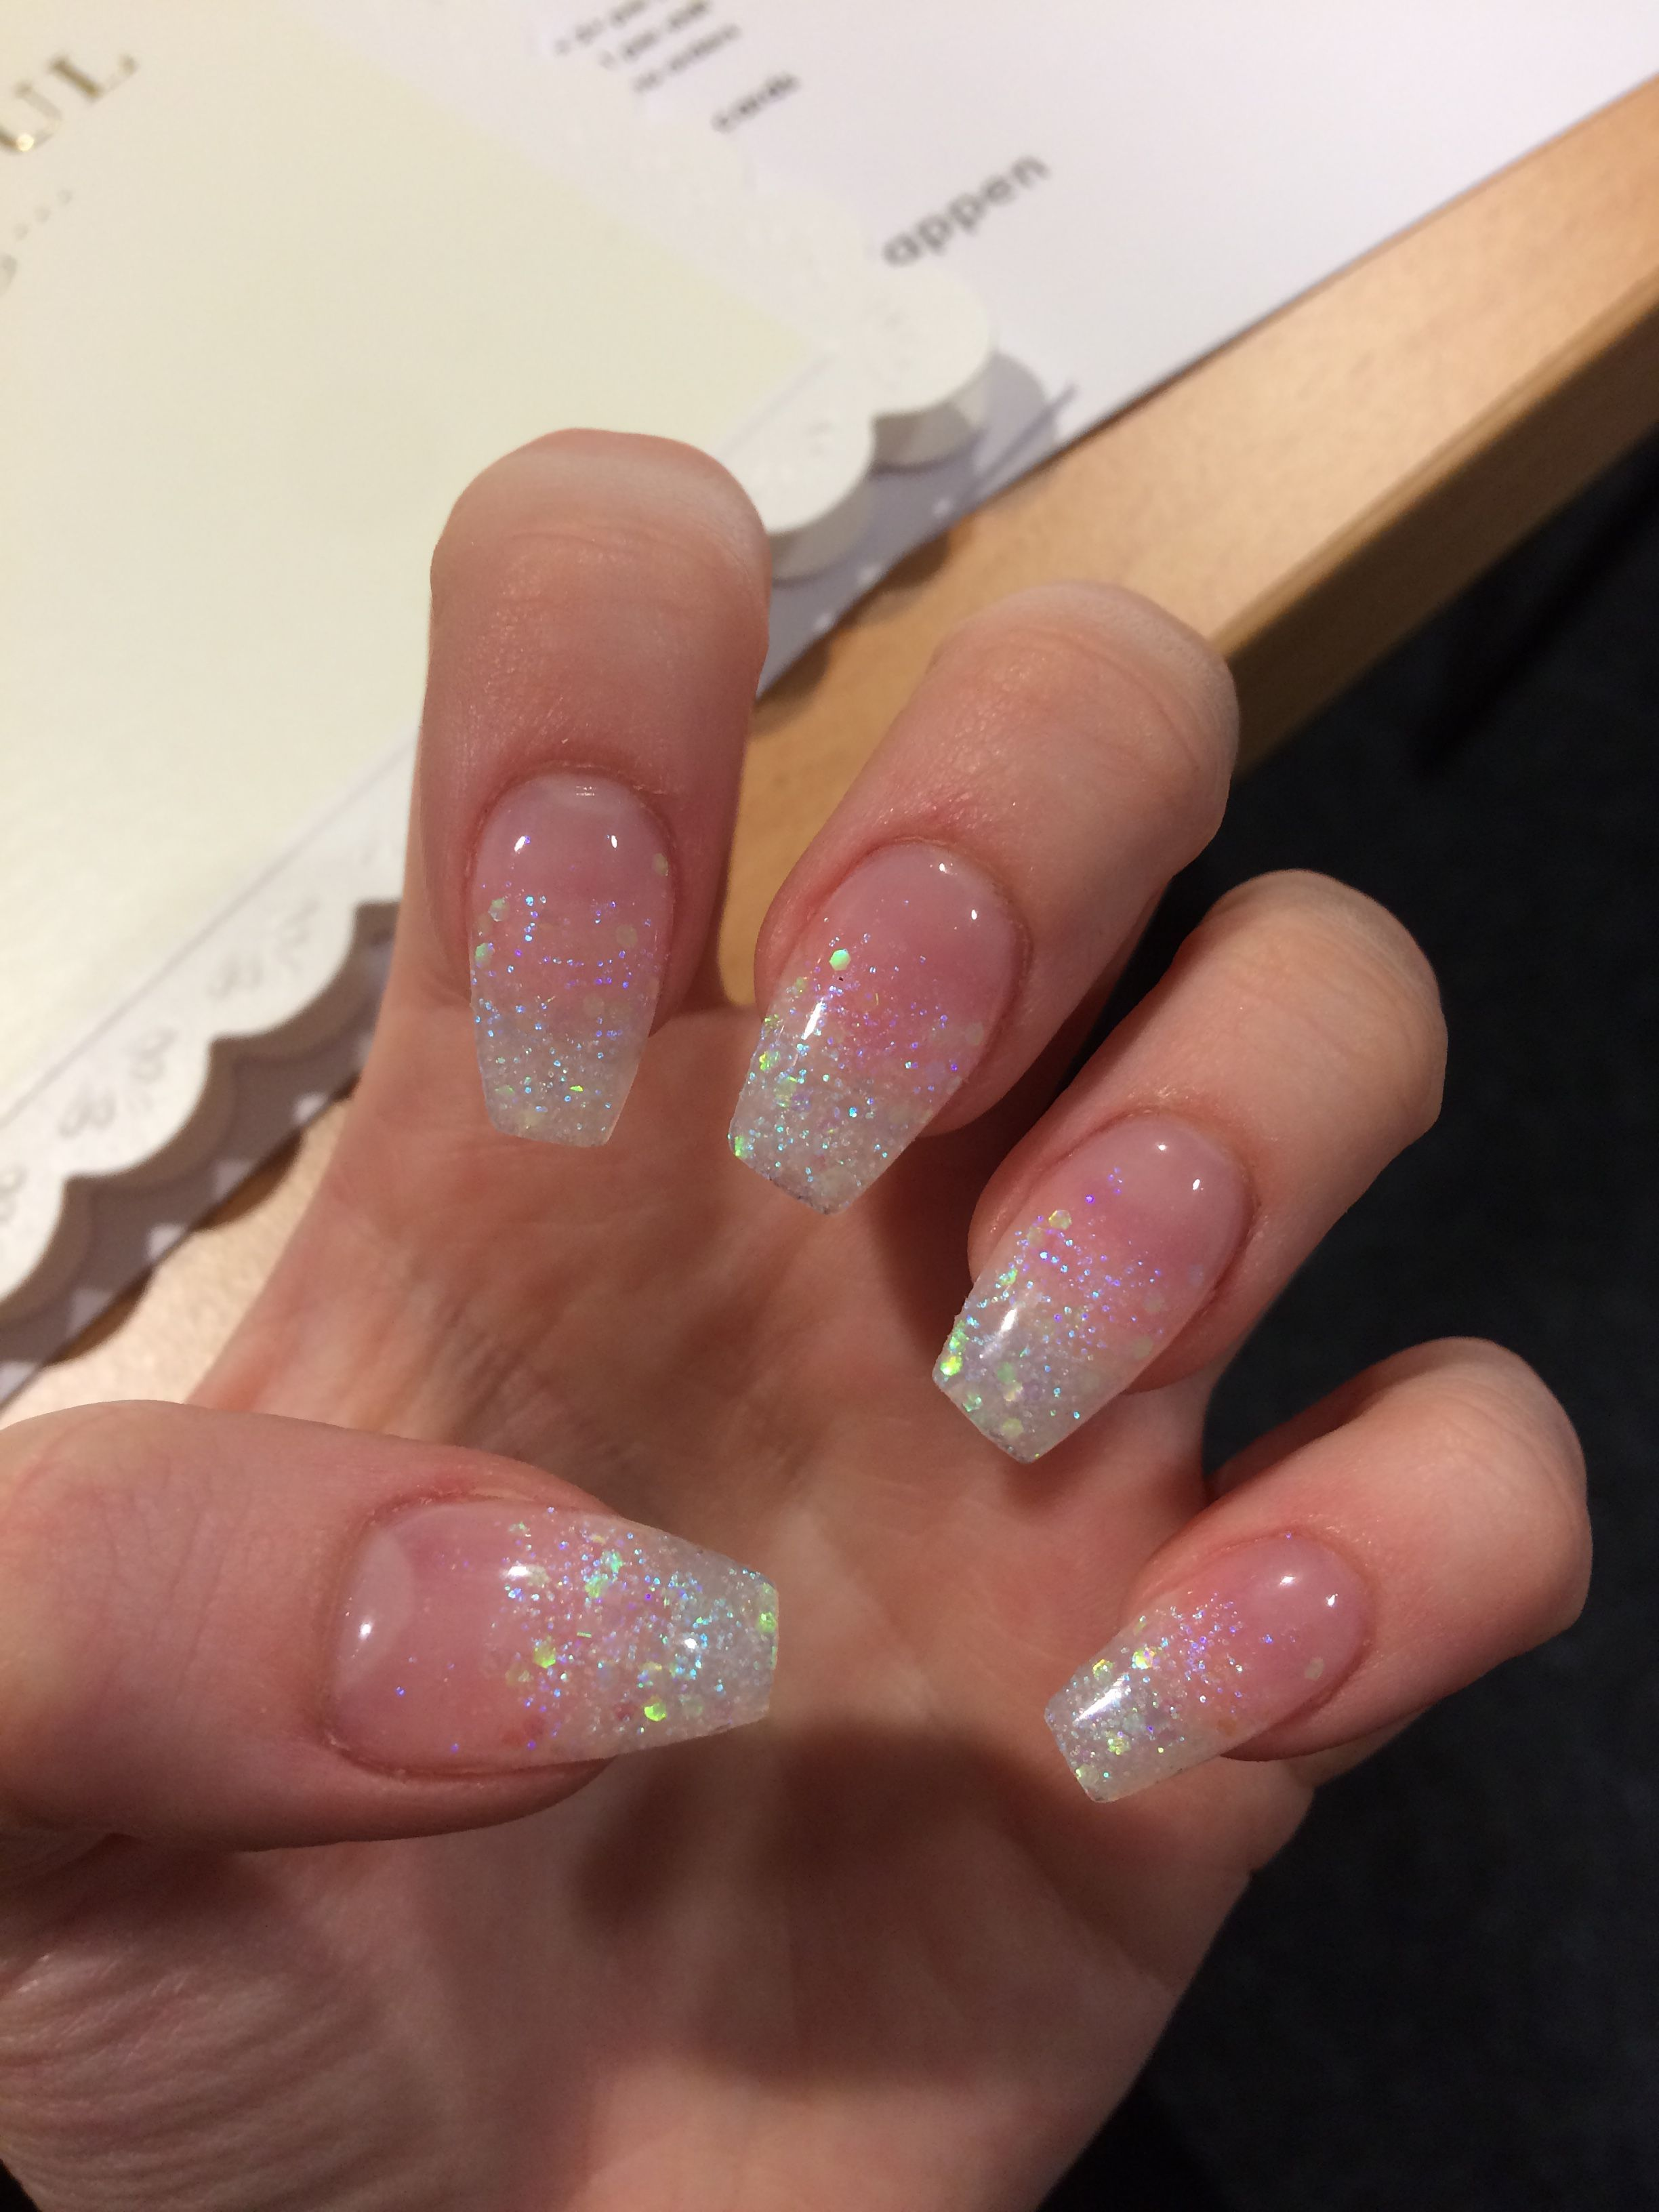 Glitter ombré acrylic coffin nails